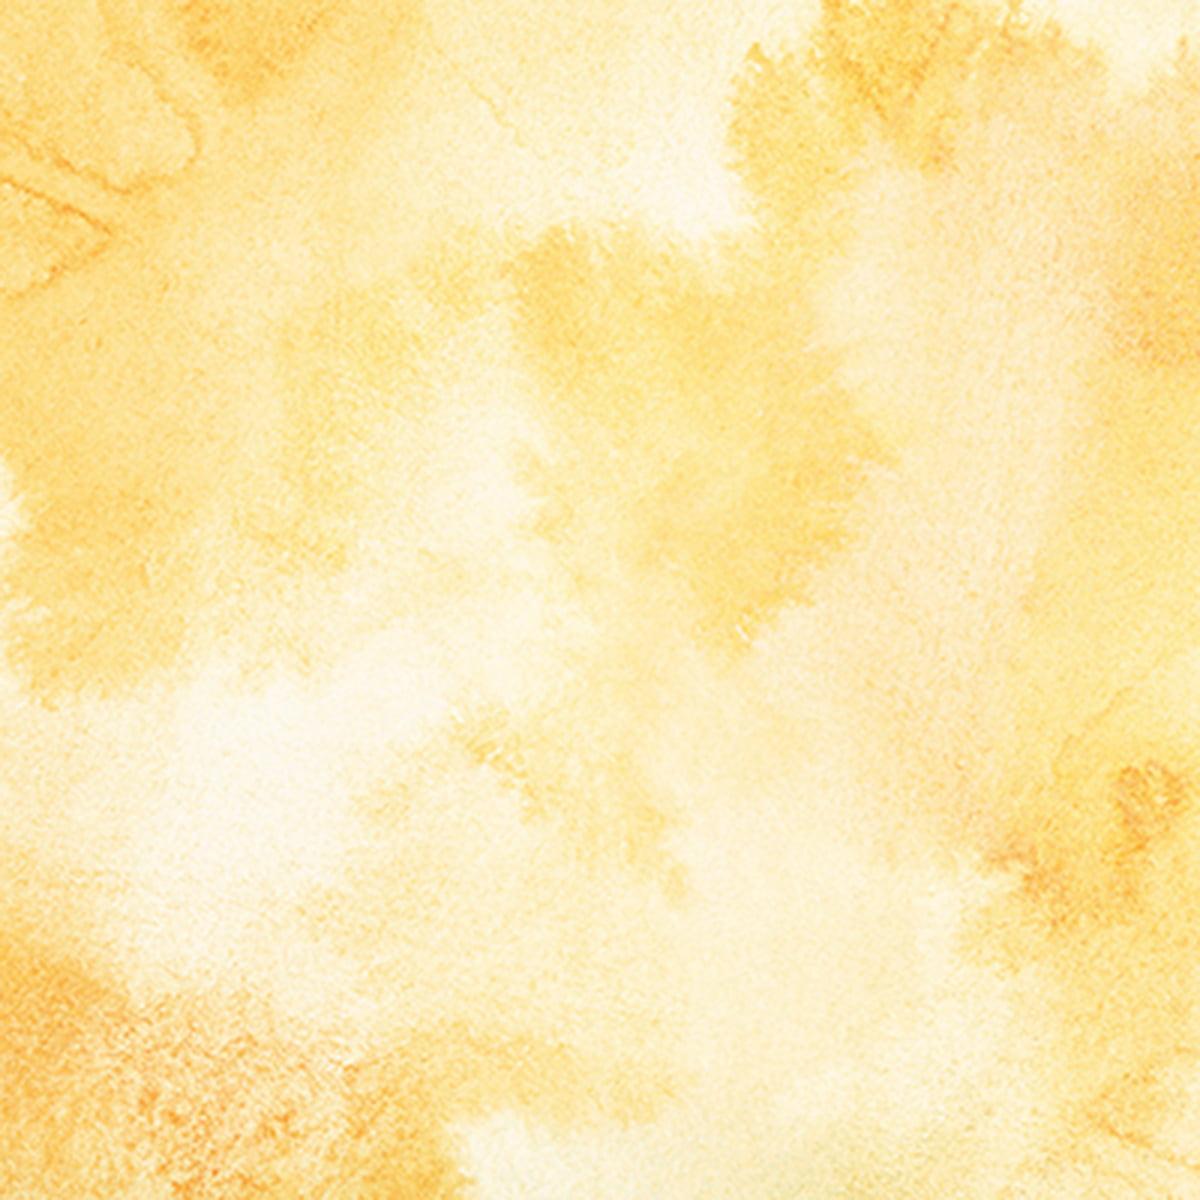 0e9079b1d021 Ella   Viv Single-Sided Backgrounds Cardstock 12